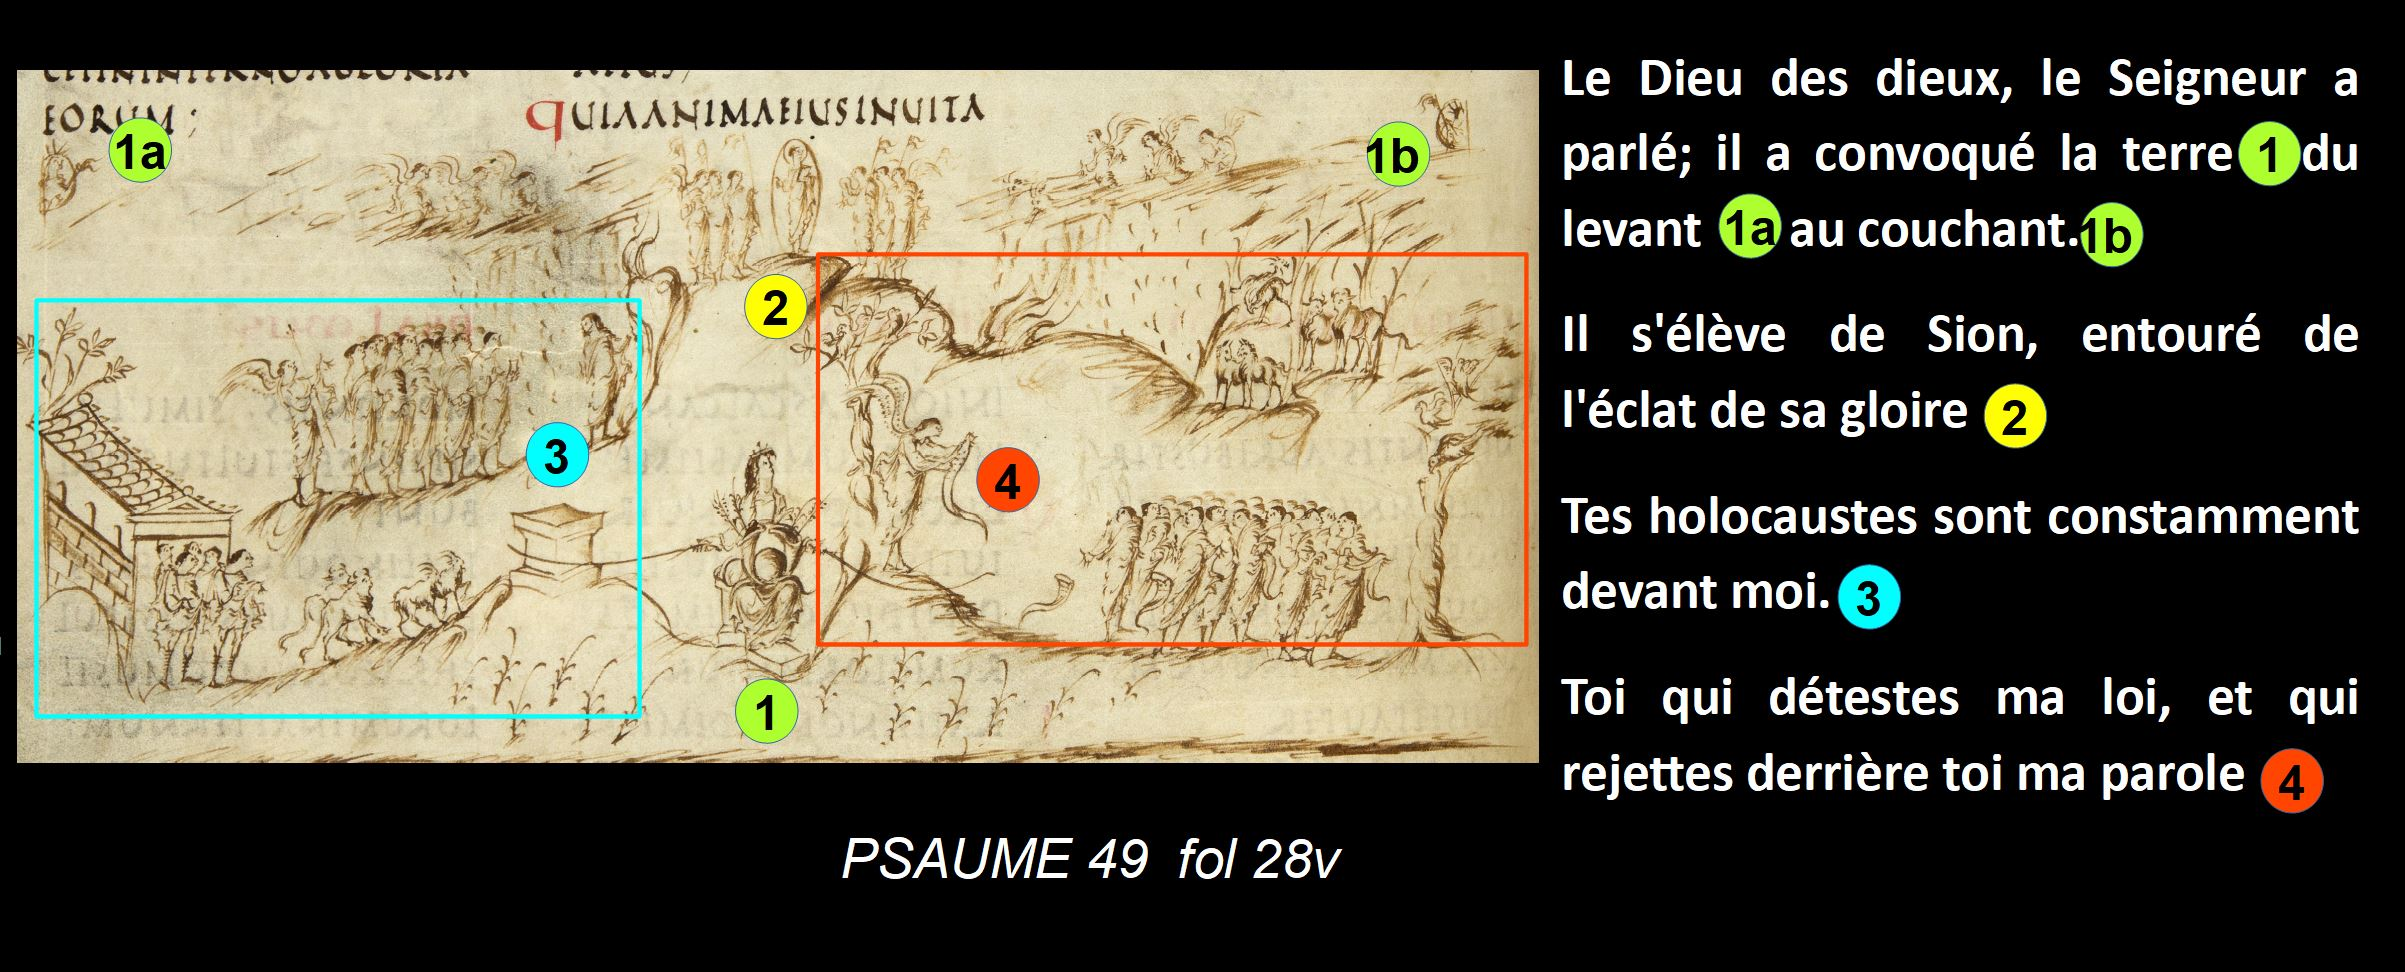 Utrecht Psalter PSAUME 49 fol 28v schema ensemble